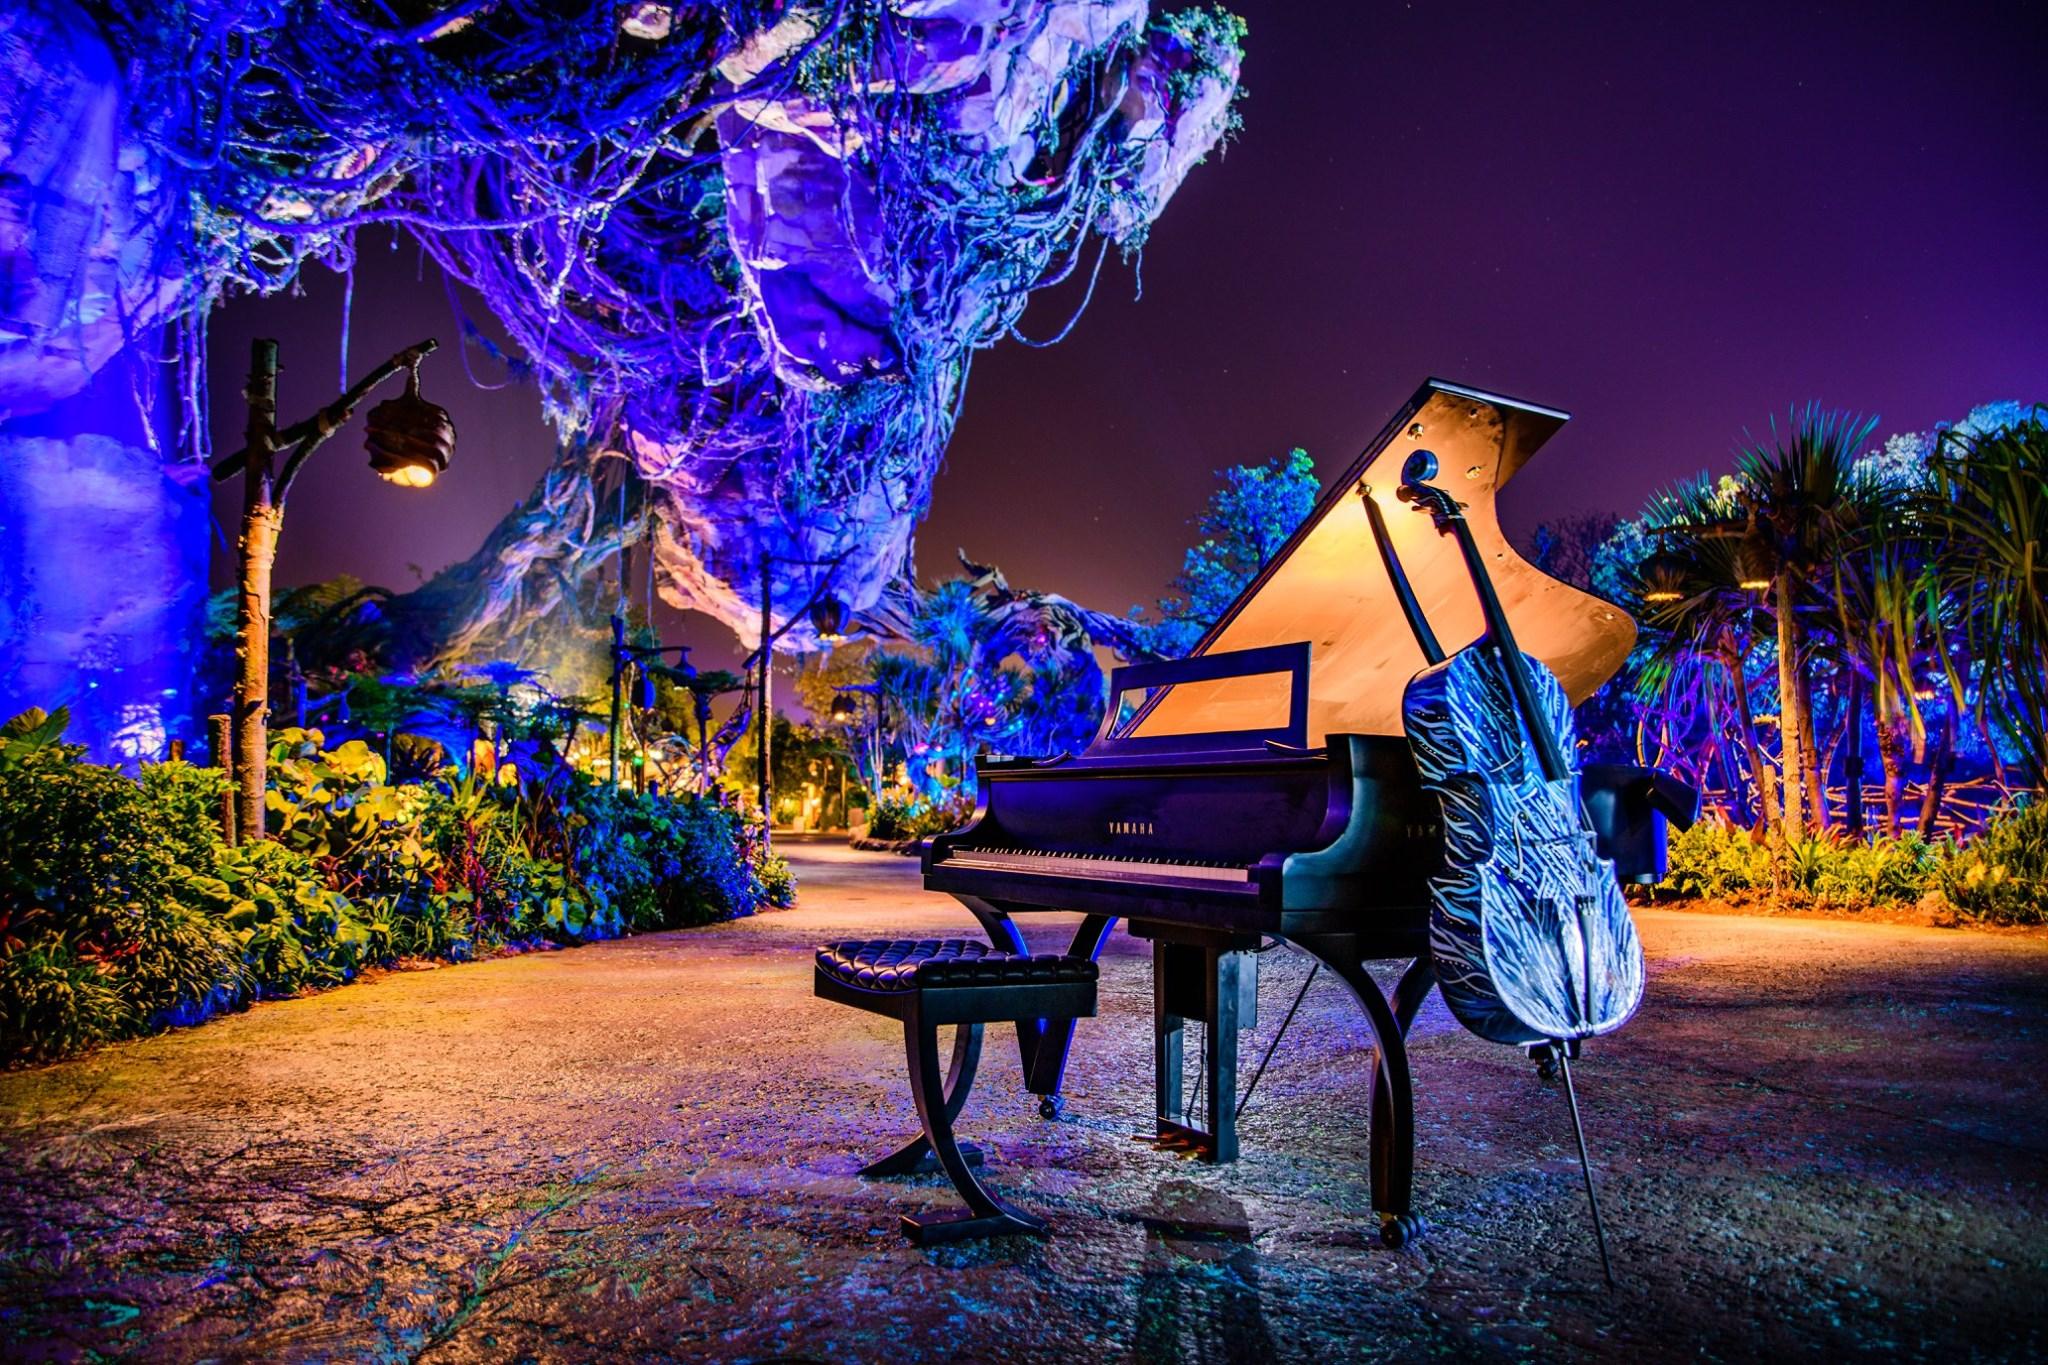 Avatar Disney The Piano Guys